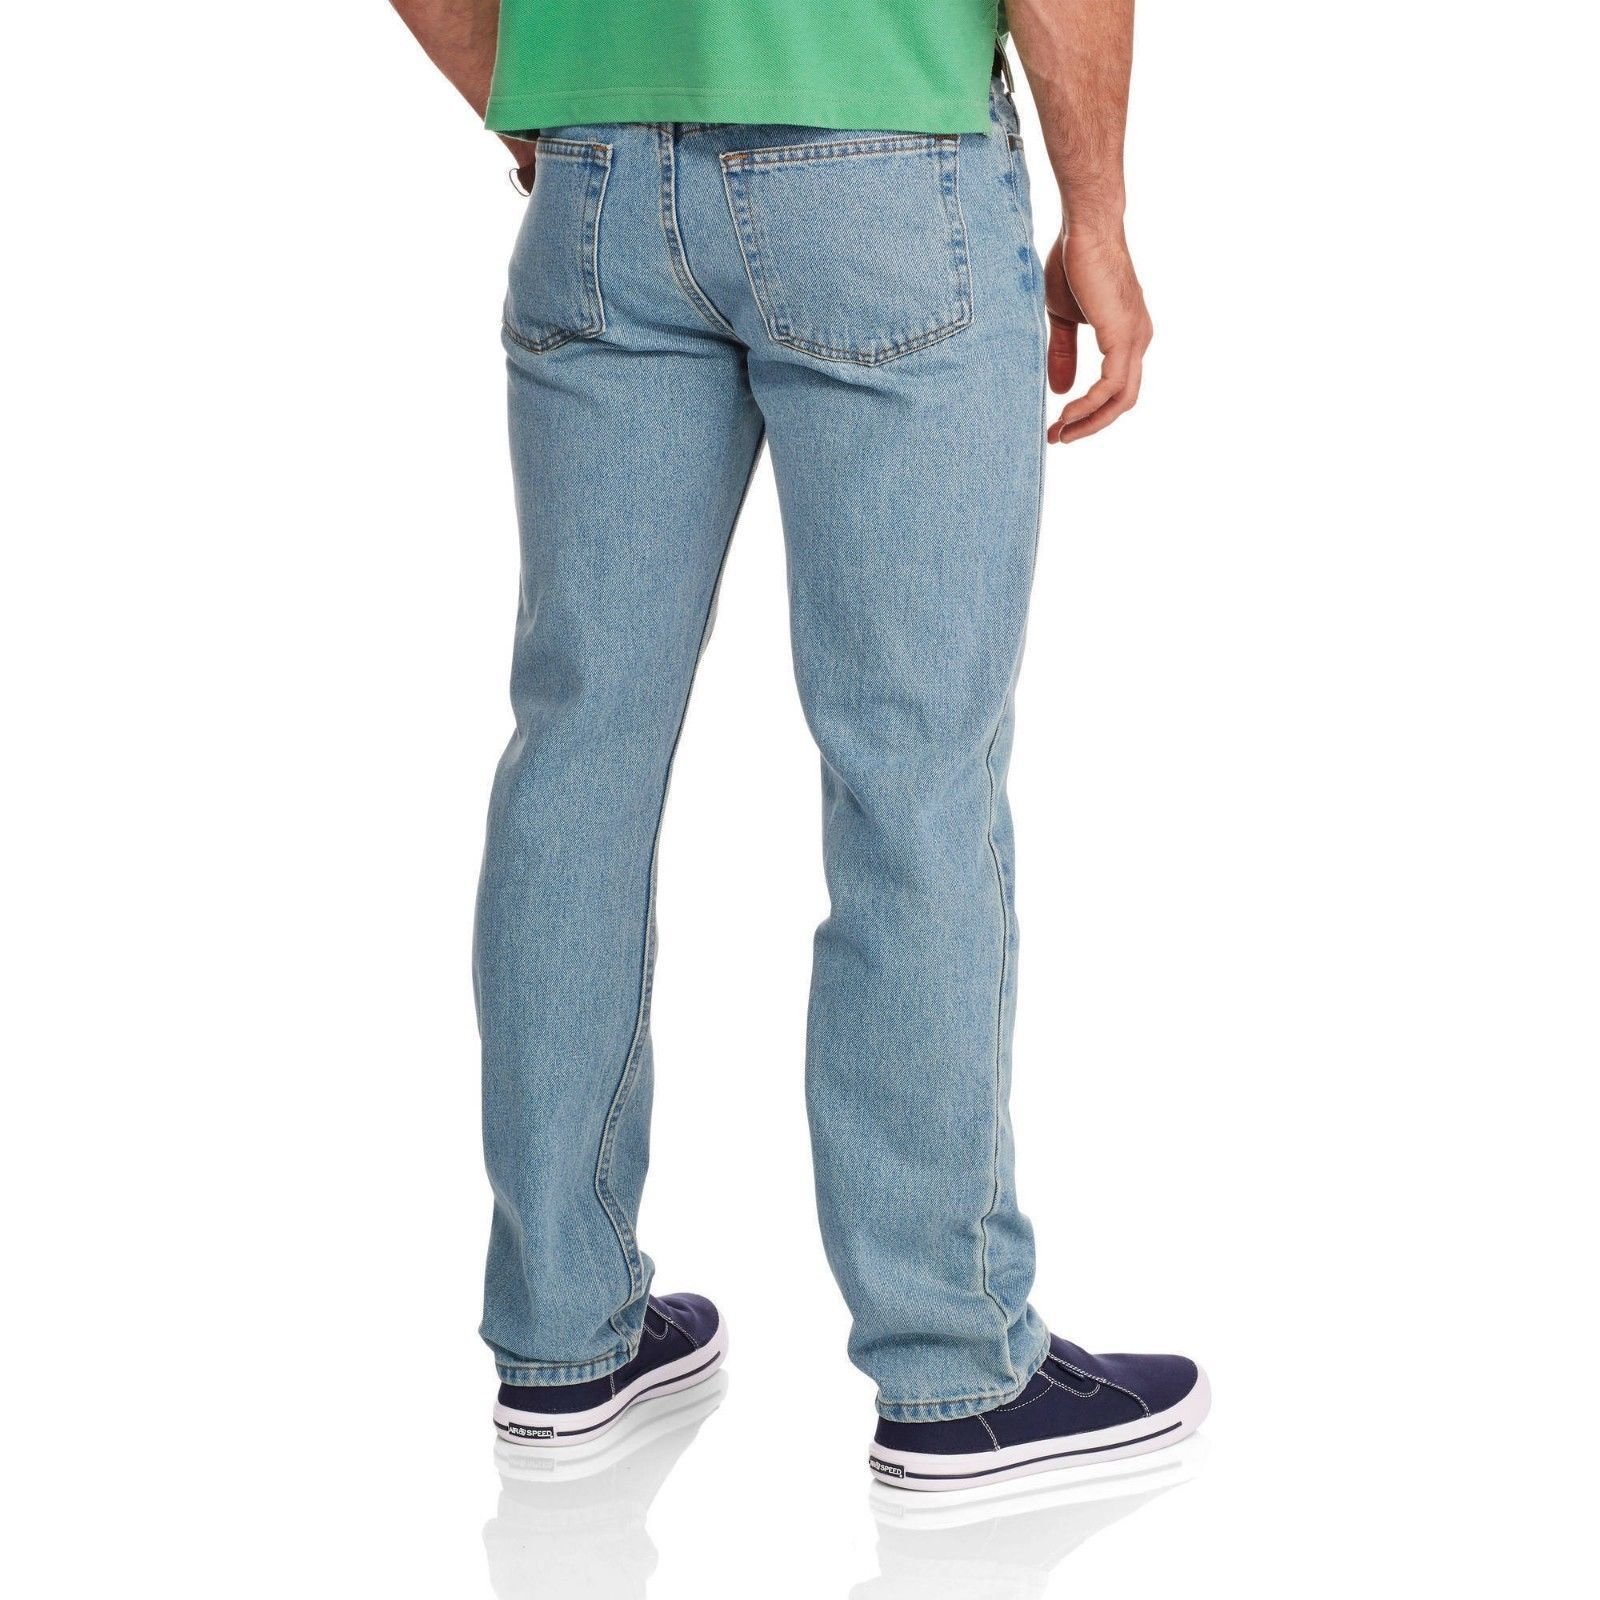 Regular 6 Regular, Black Faded Glory Boys Relaxed Fit Denim Blue Jeans